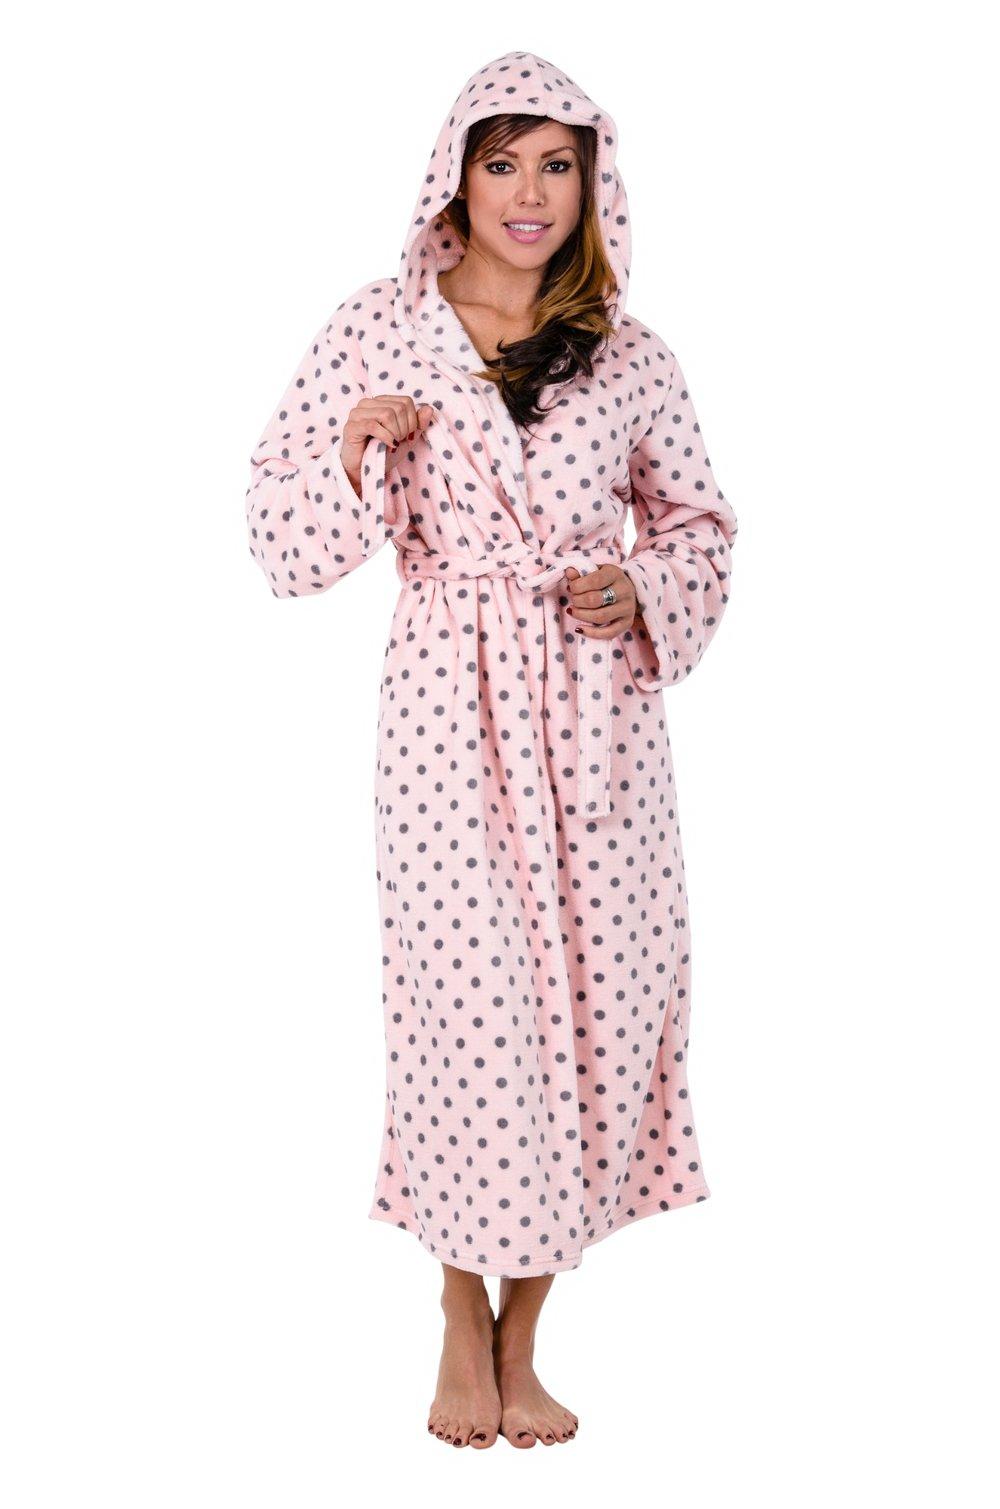 Hoodie Robe Hooded Robe Spa Bathrobe Hoody Robe Long Robe … (Large, Pink Polka Dot) by Love This Robe (Image #2)